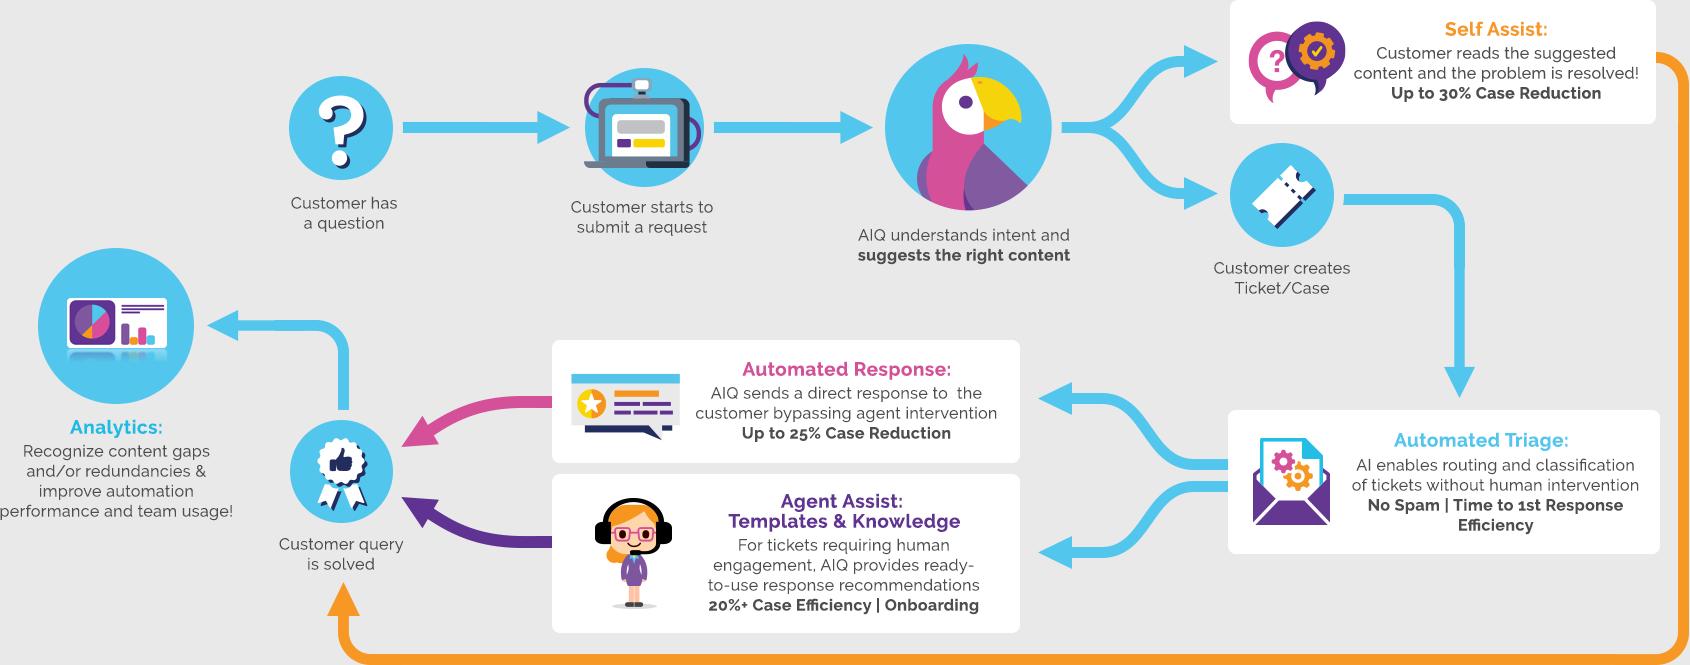 How AI Based Customer Service Works